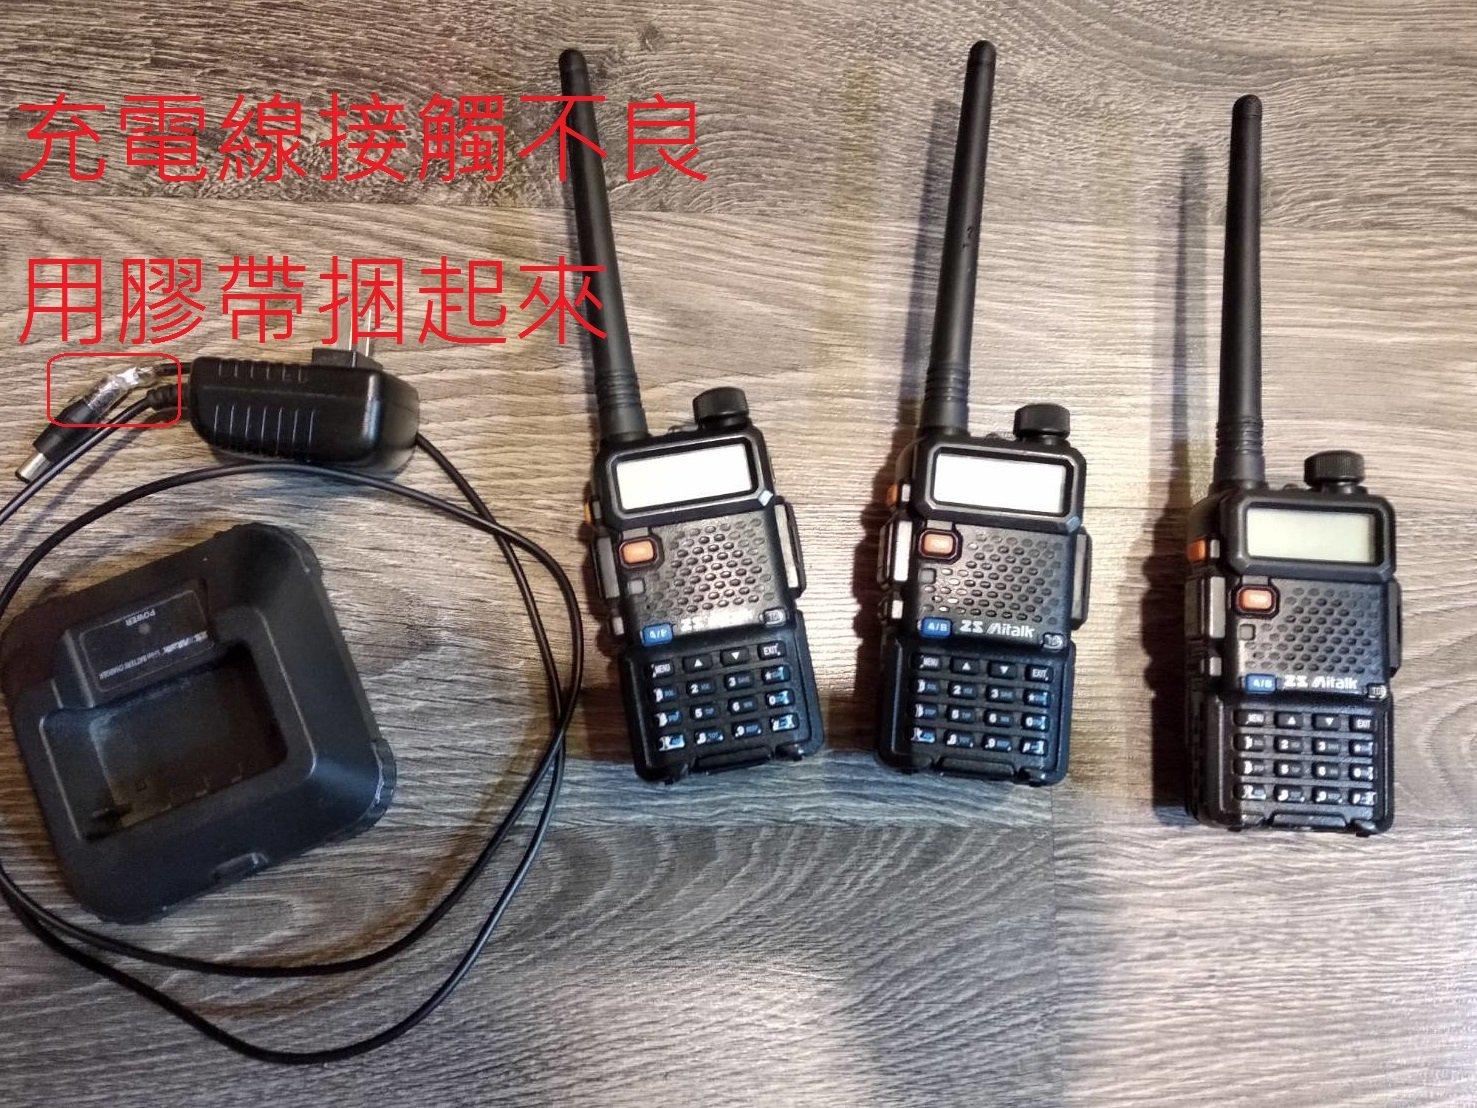 Zs Aitalk 愛客星 型號AT-3069A無線電對講機  對講機 專用 102AR3012, 三支一起便宜賣